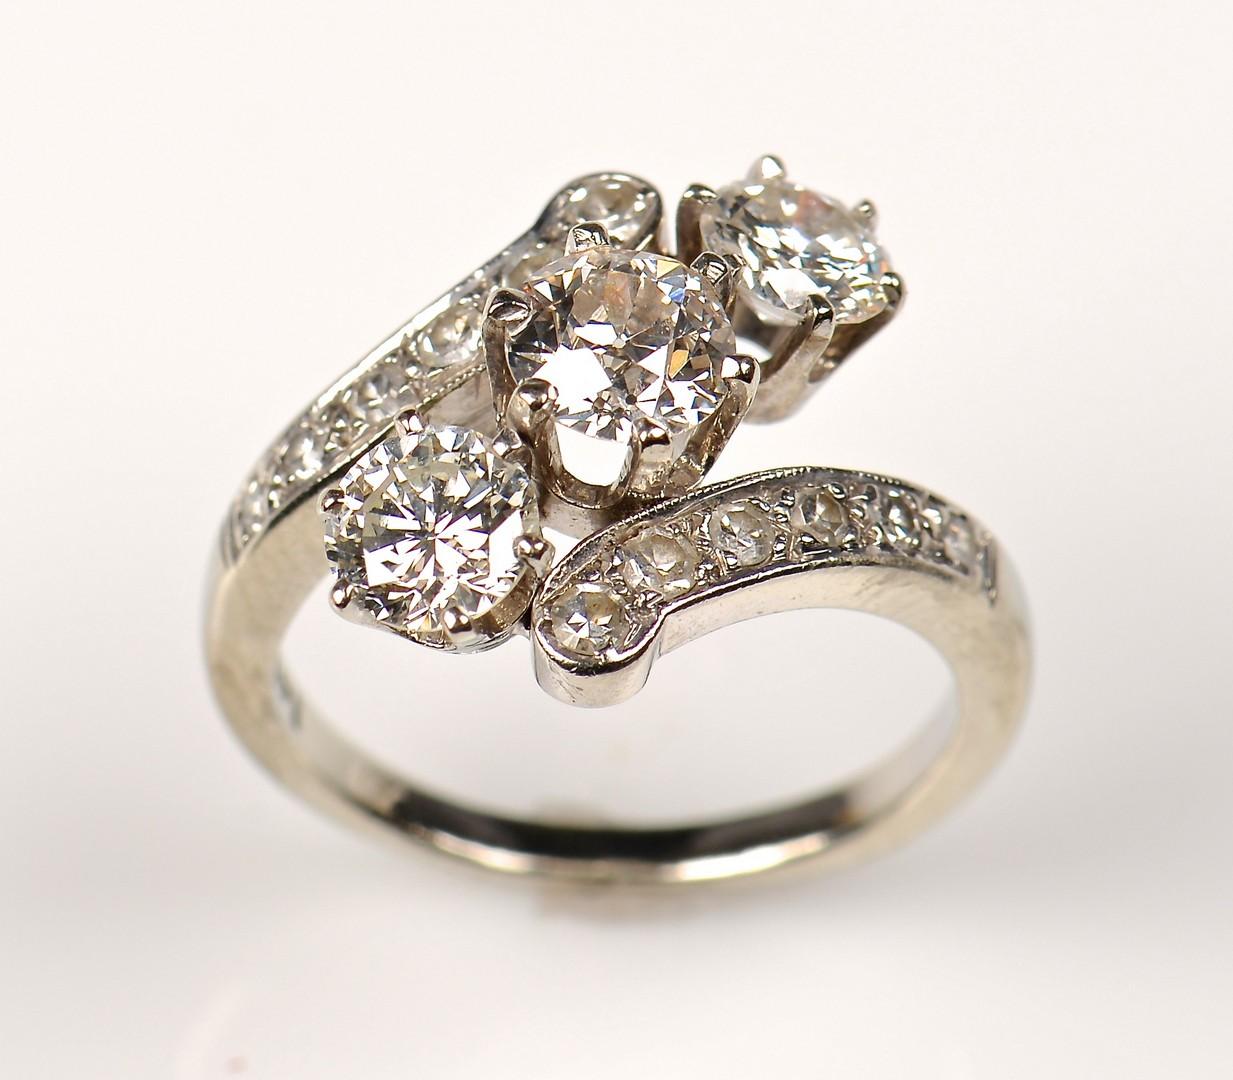 Lot 77: 14K Diamond Estate Ring, c. 1940